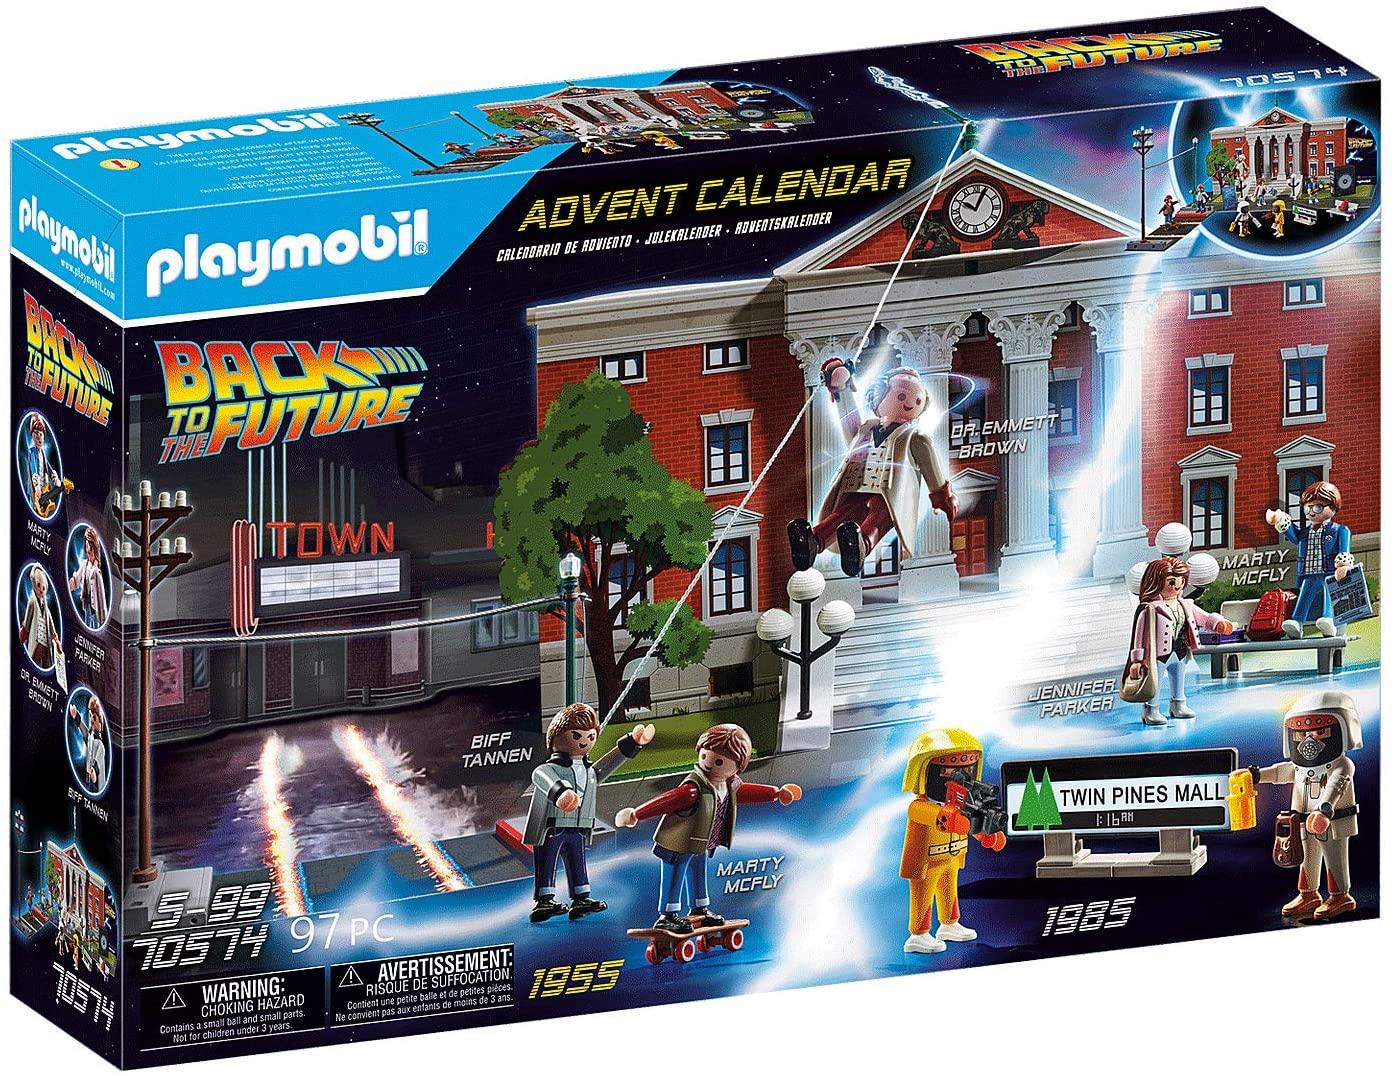 Playmobil Back To The Future Advent Calendar 2020